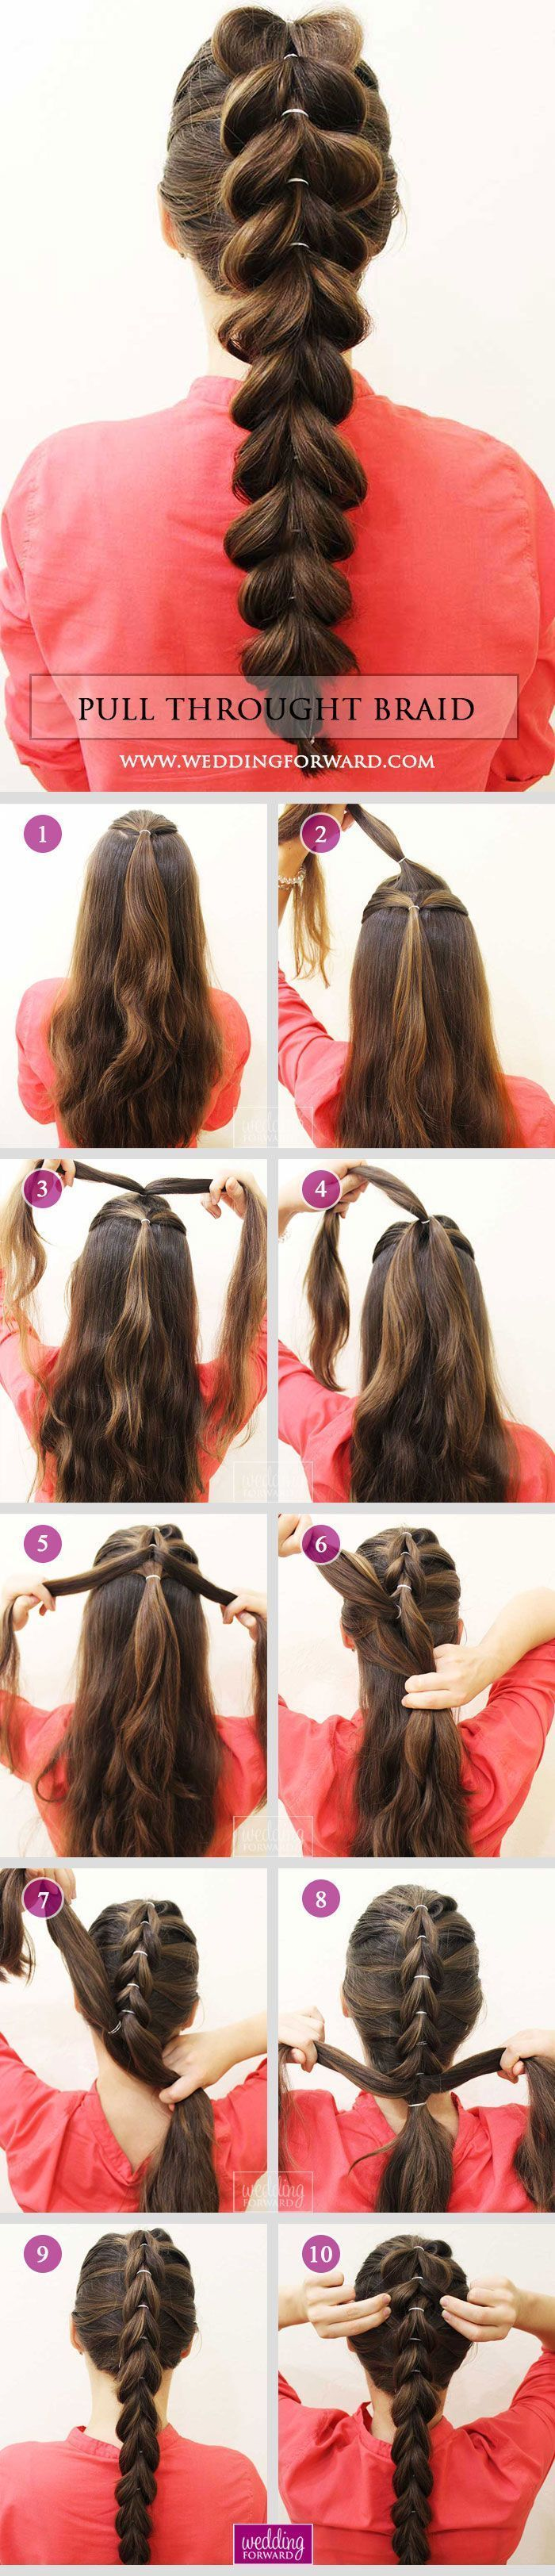 25 Best Ideas About Braided Wedding Hair On Pinterest